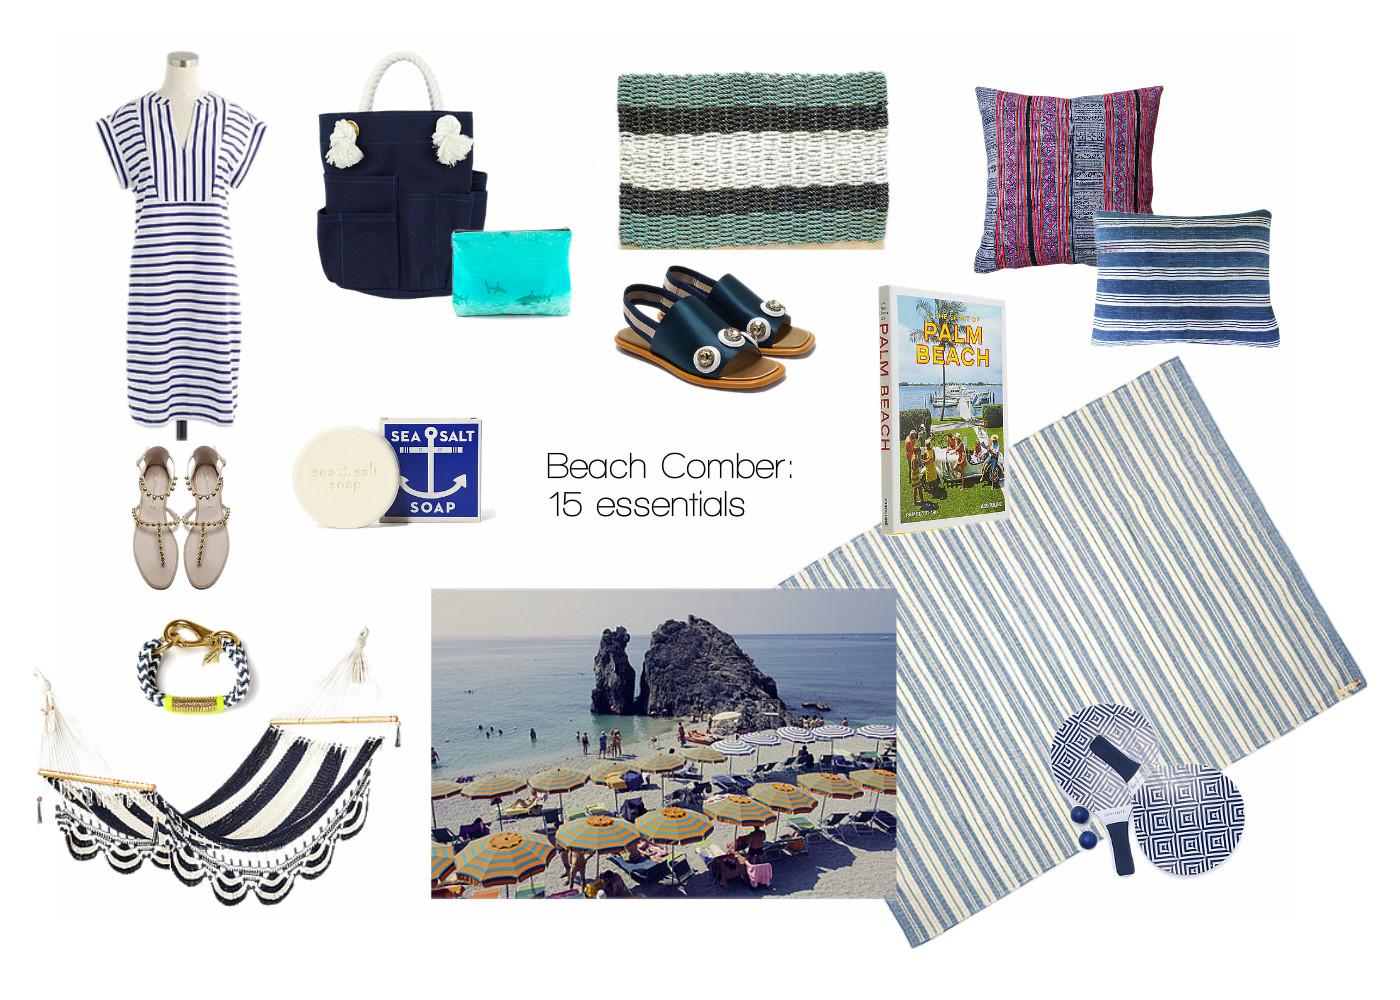 beach-ocmber-15-essentials